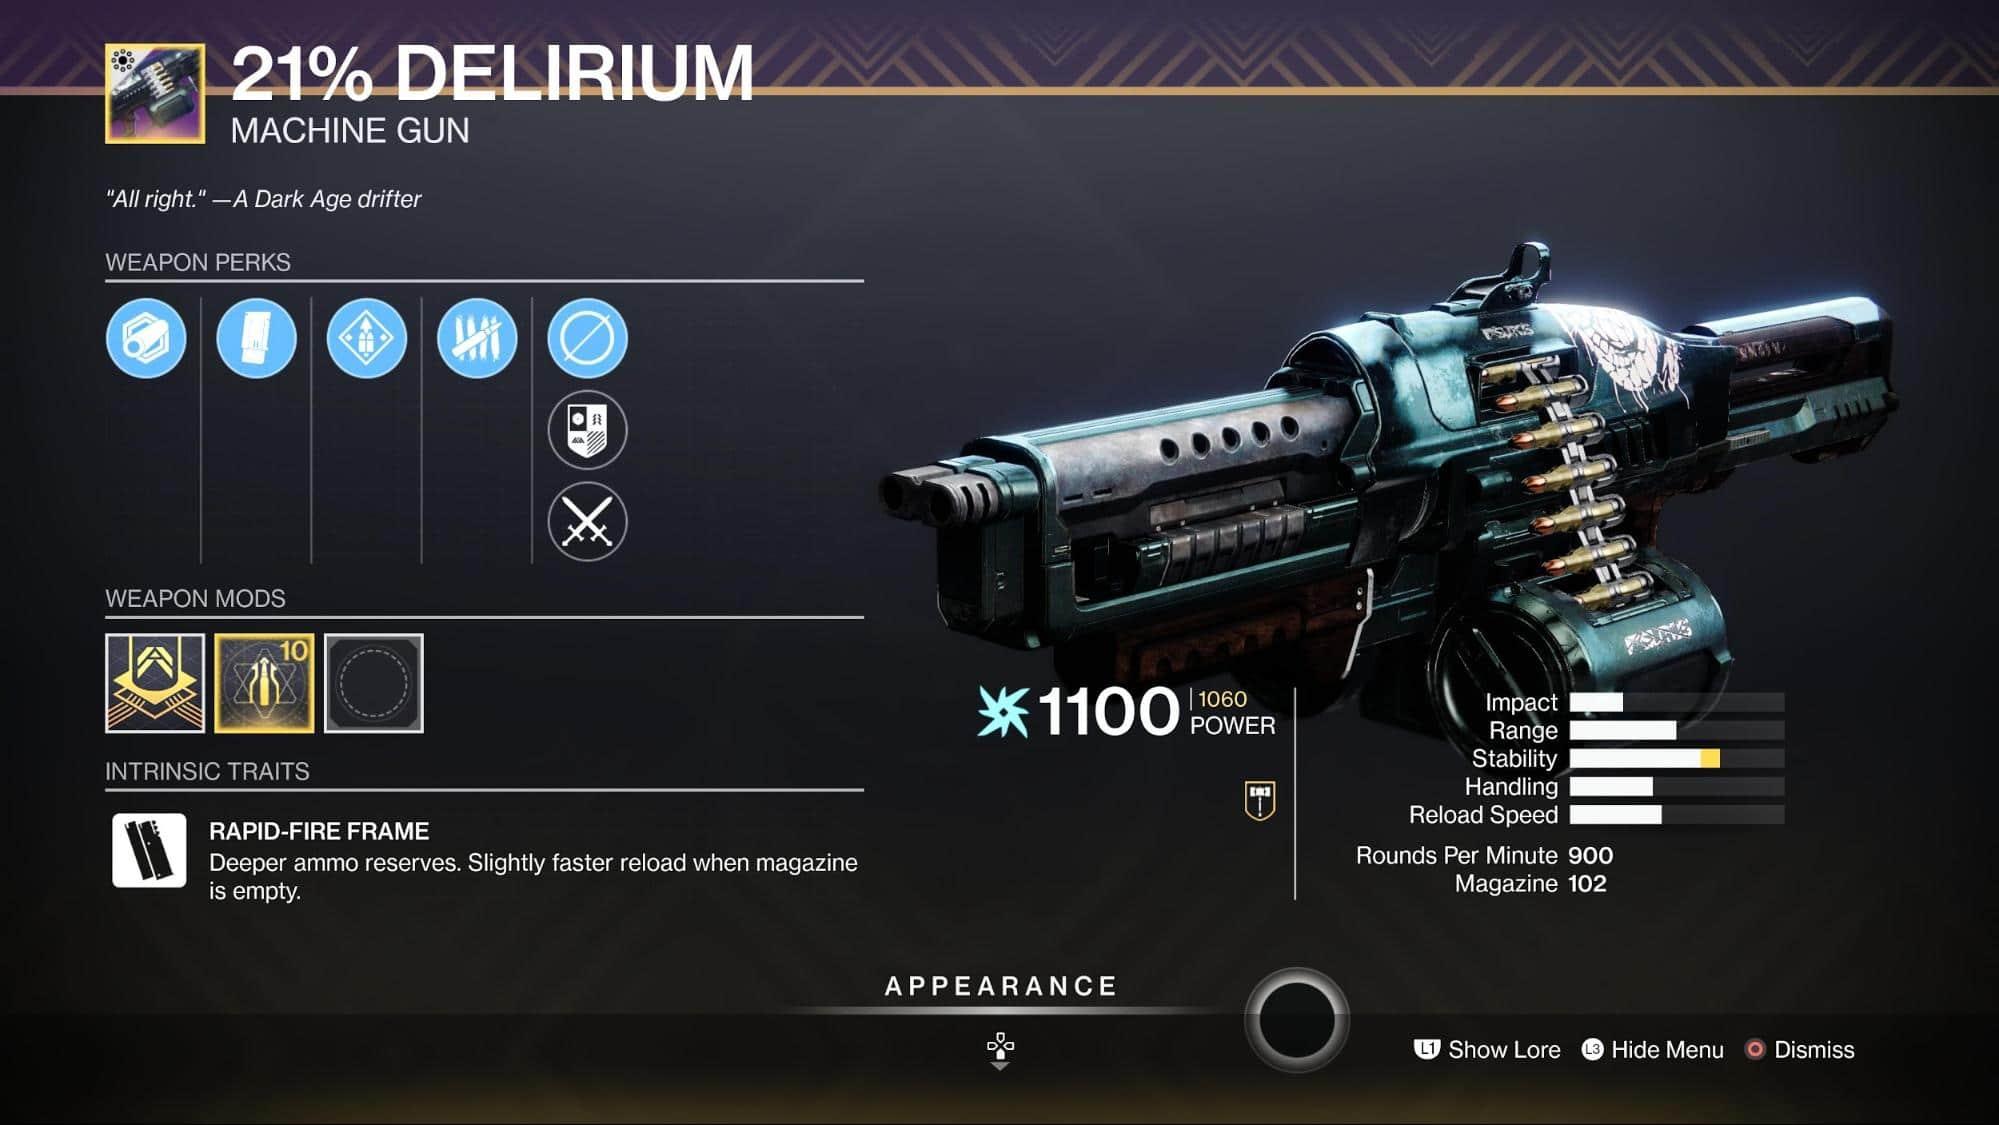 HGG Destiny 2 21-Delirium